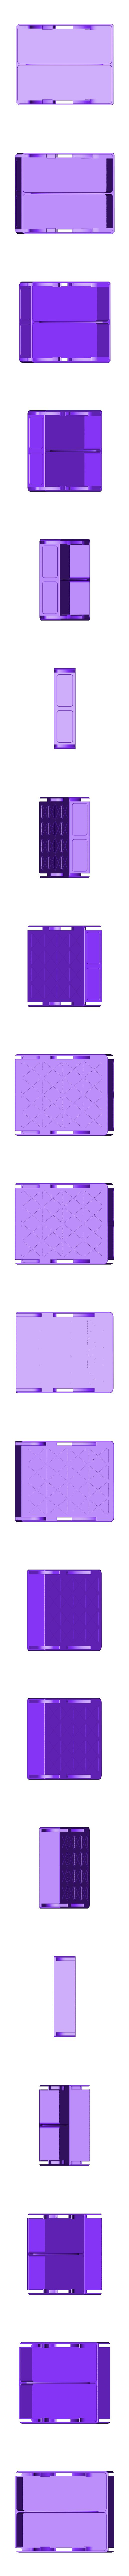 cont liv 2 2 pz.stl Download STL file Multiple container ( closed 180x370mm) construction Contenitore multipla trasportabile Multibox • 3D printable design, mikifly10